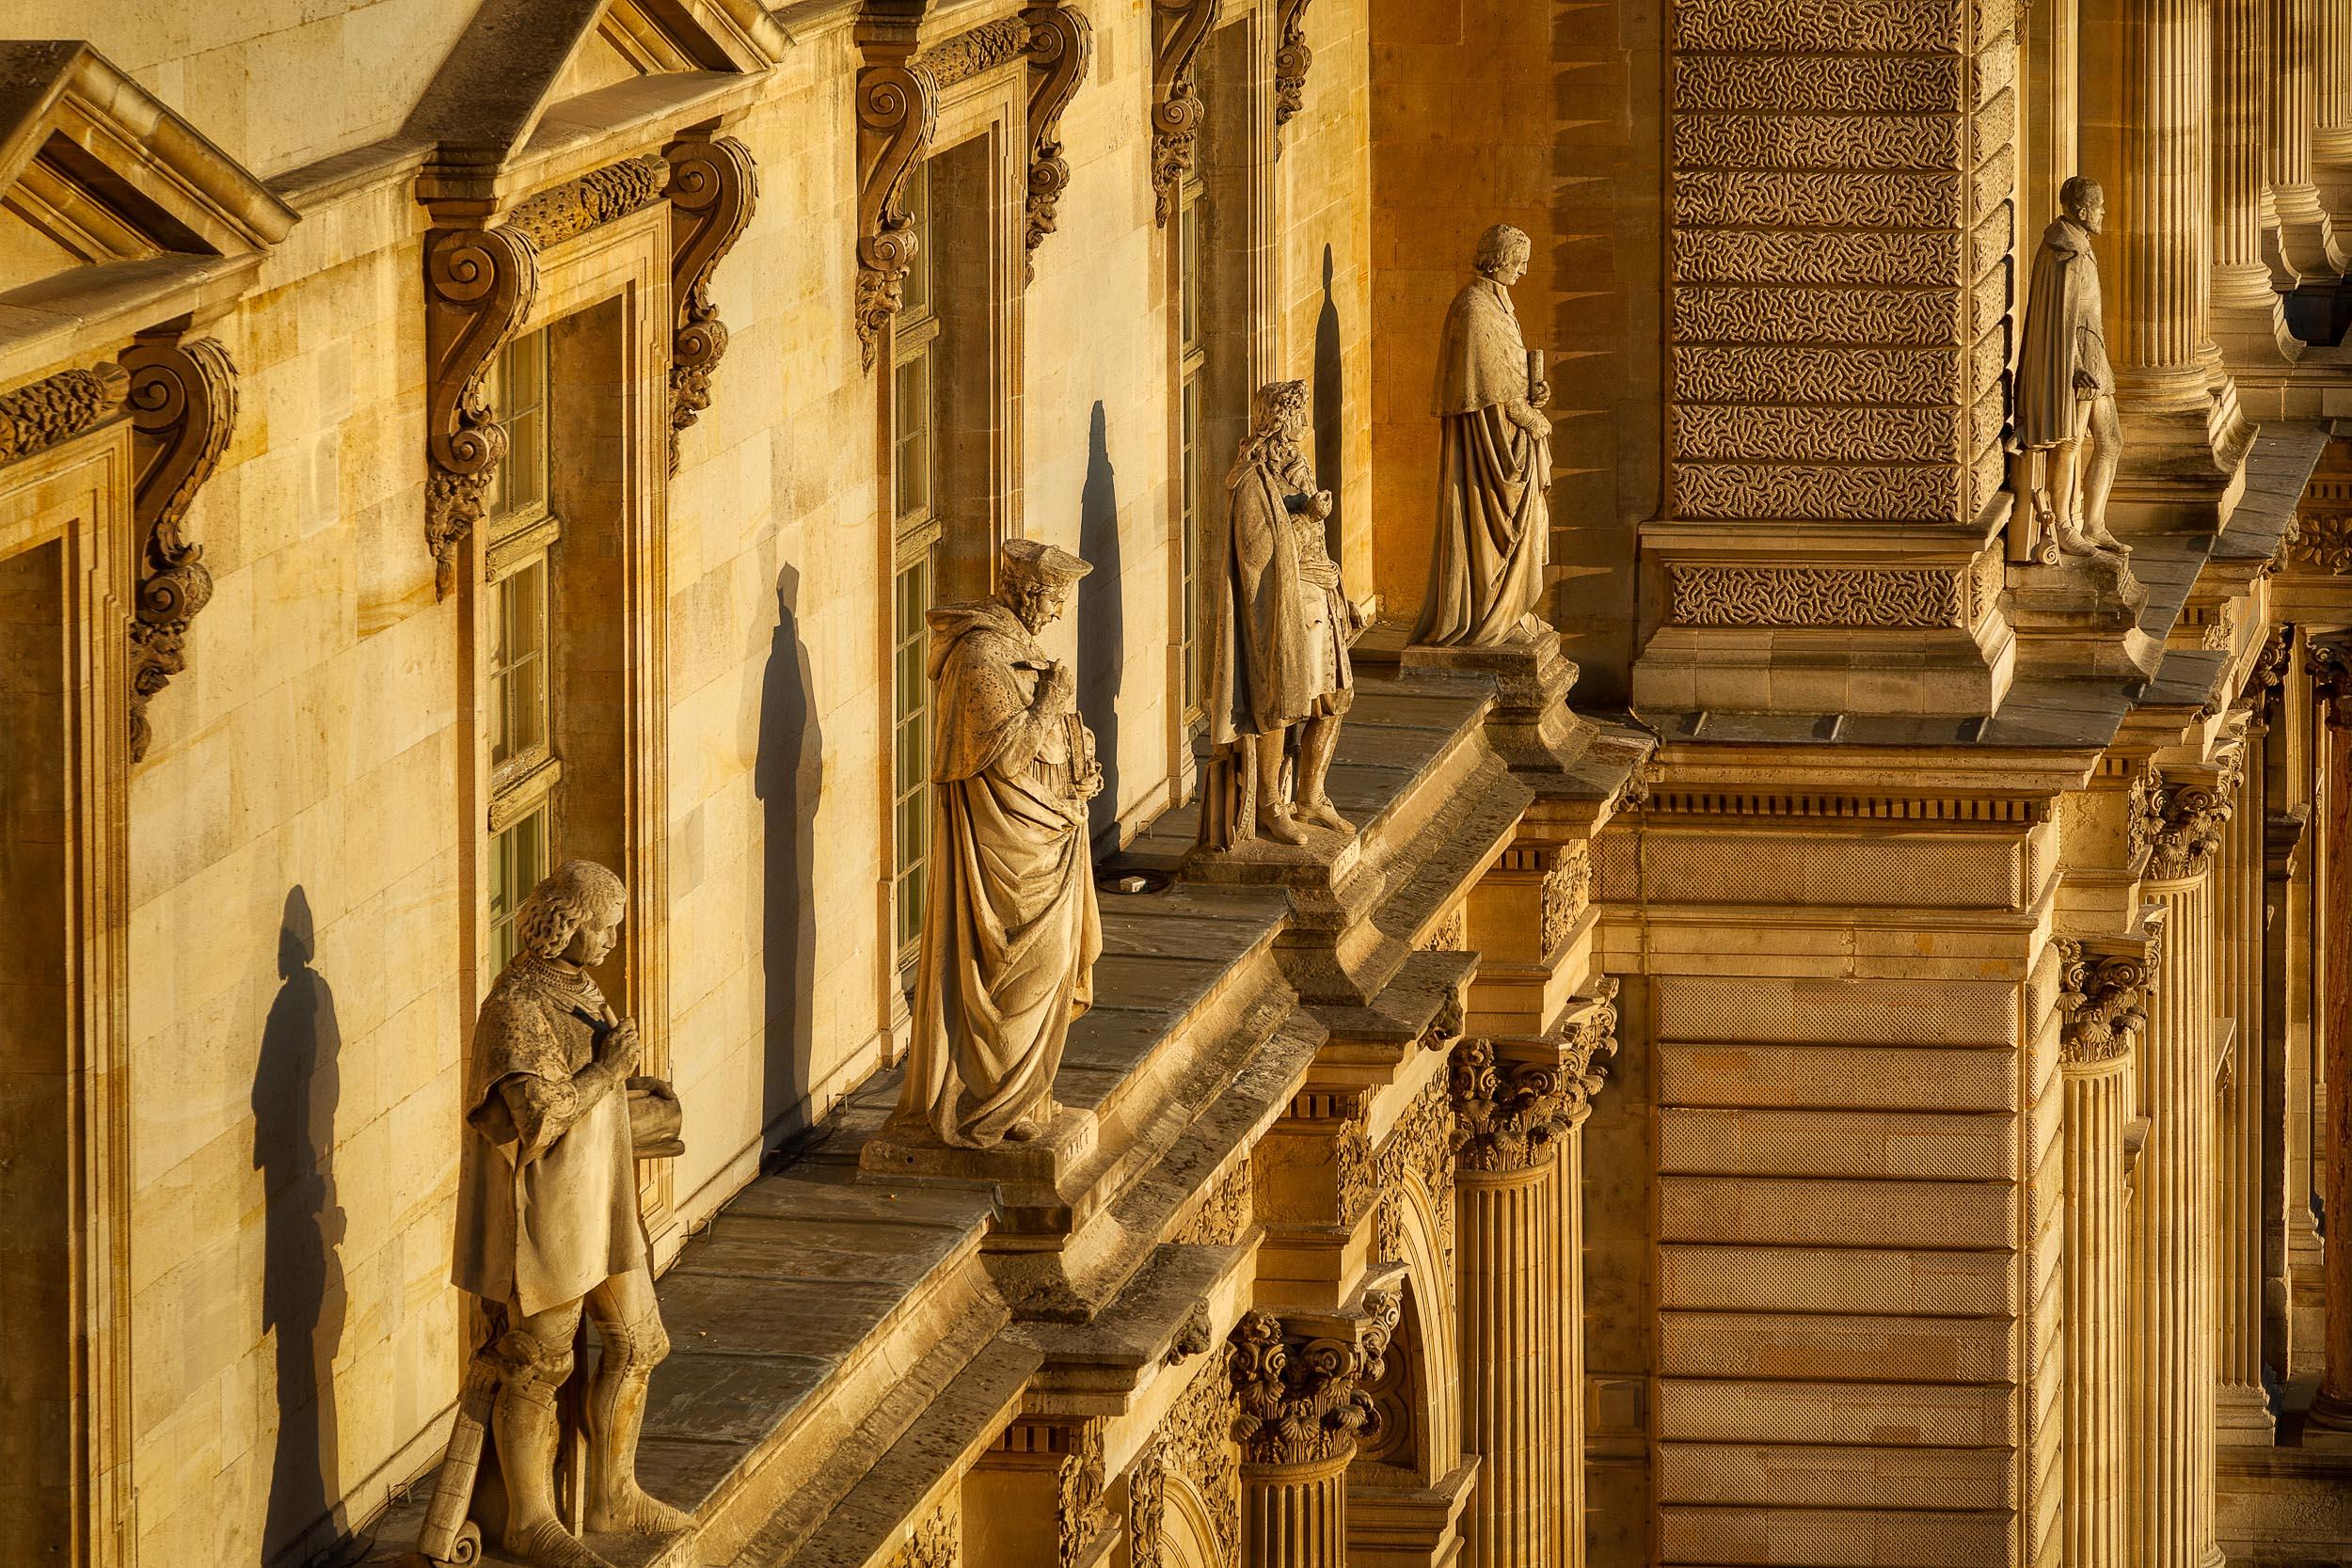 Late afternoon light bathes statues atop the Musée du Louvre in Paris, France.